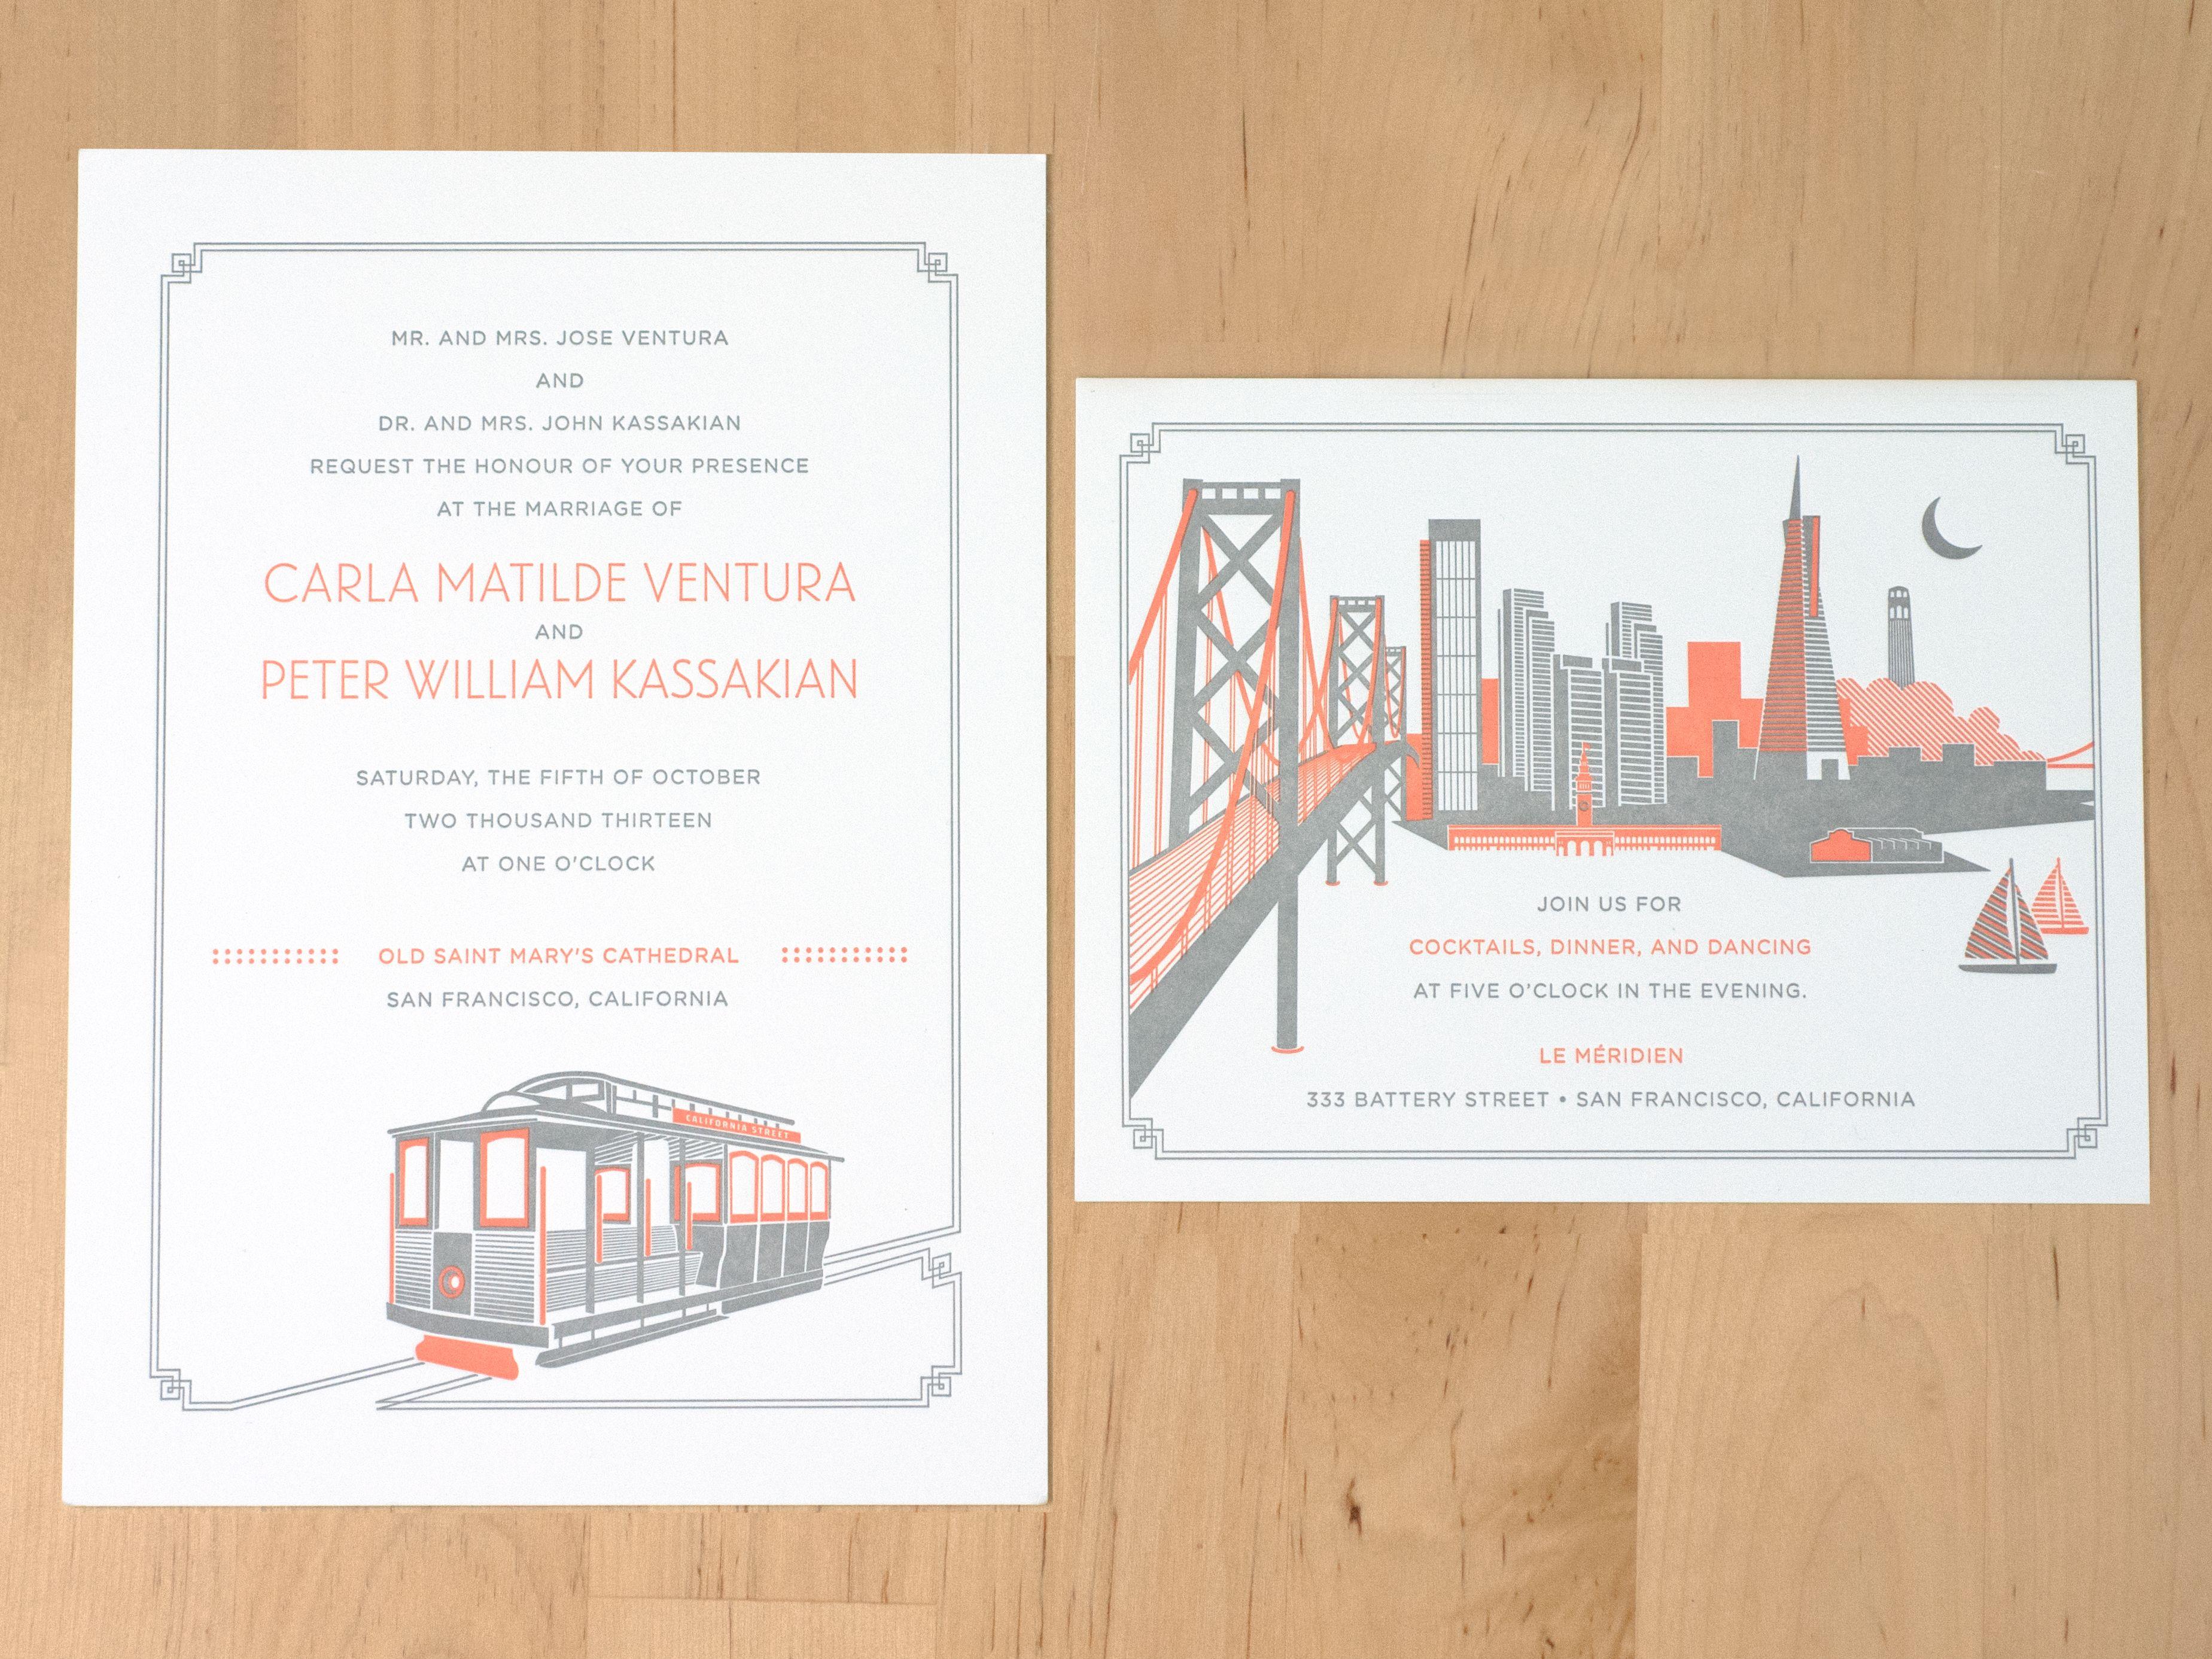 San francisco wedding invitations design des troy our wedding san francisco wedding invitations design des troy stopboris Choice Image